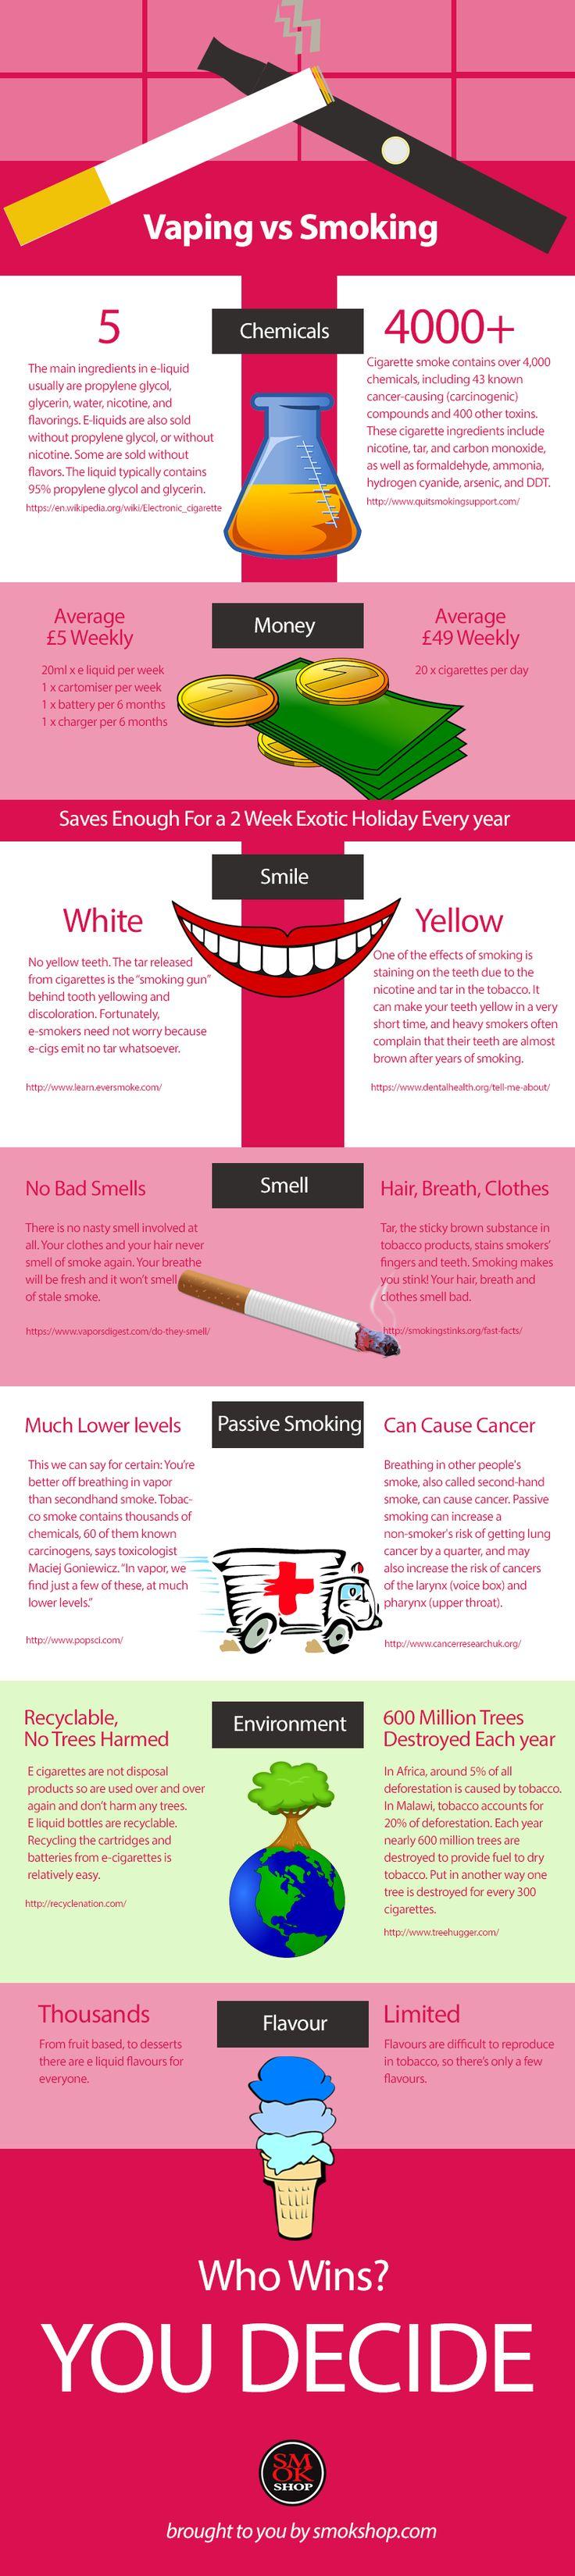 Vaping vs Smoking. Puff & spin.. www.dizzyspinners…